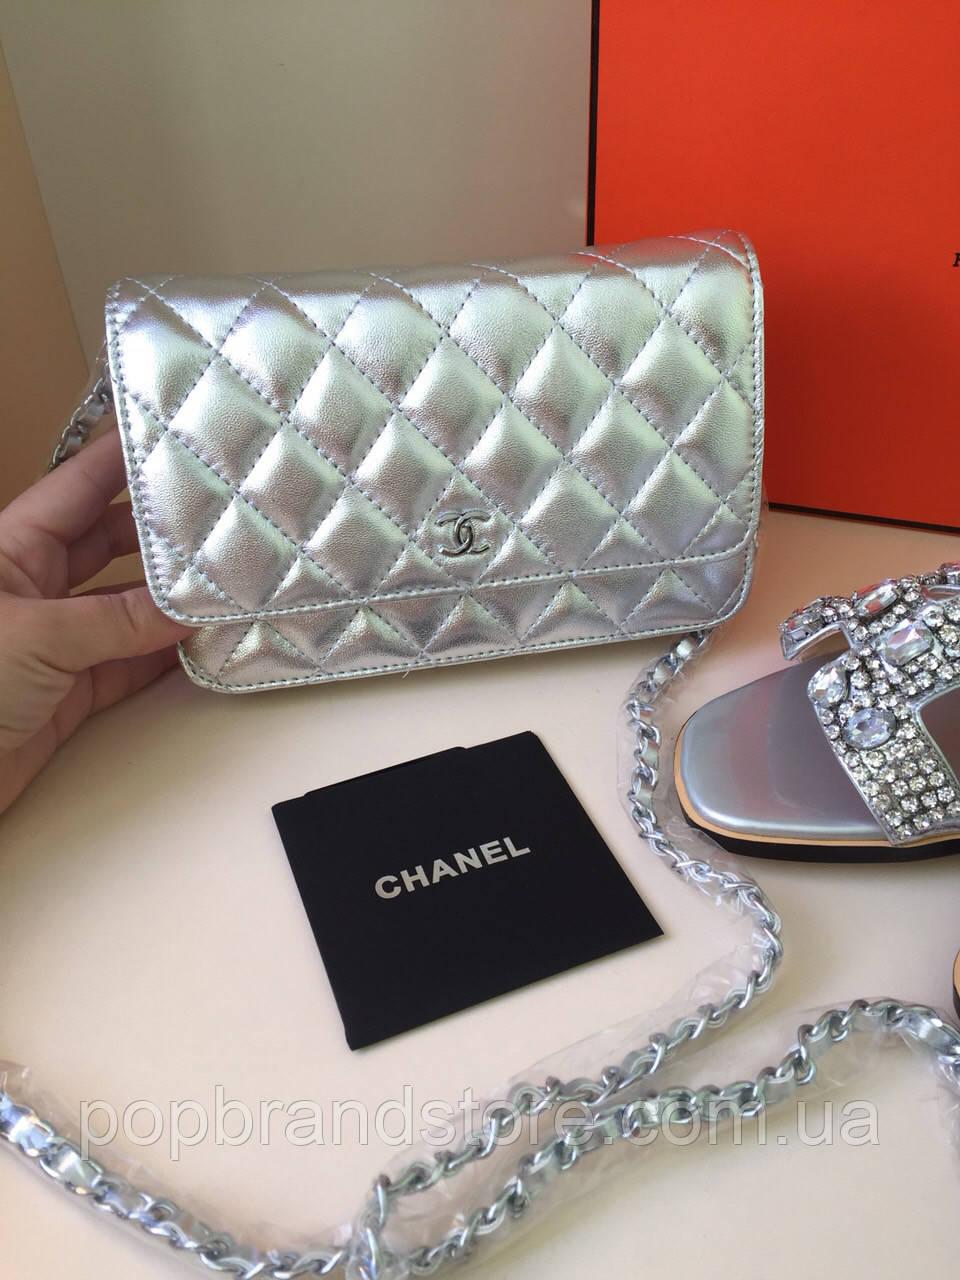 2dc56dee0dda Мини-сумочка Chanel WOC серебро (реплика) - Pop Brand Store | брендовые  сумки